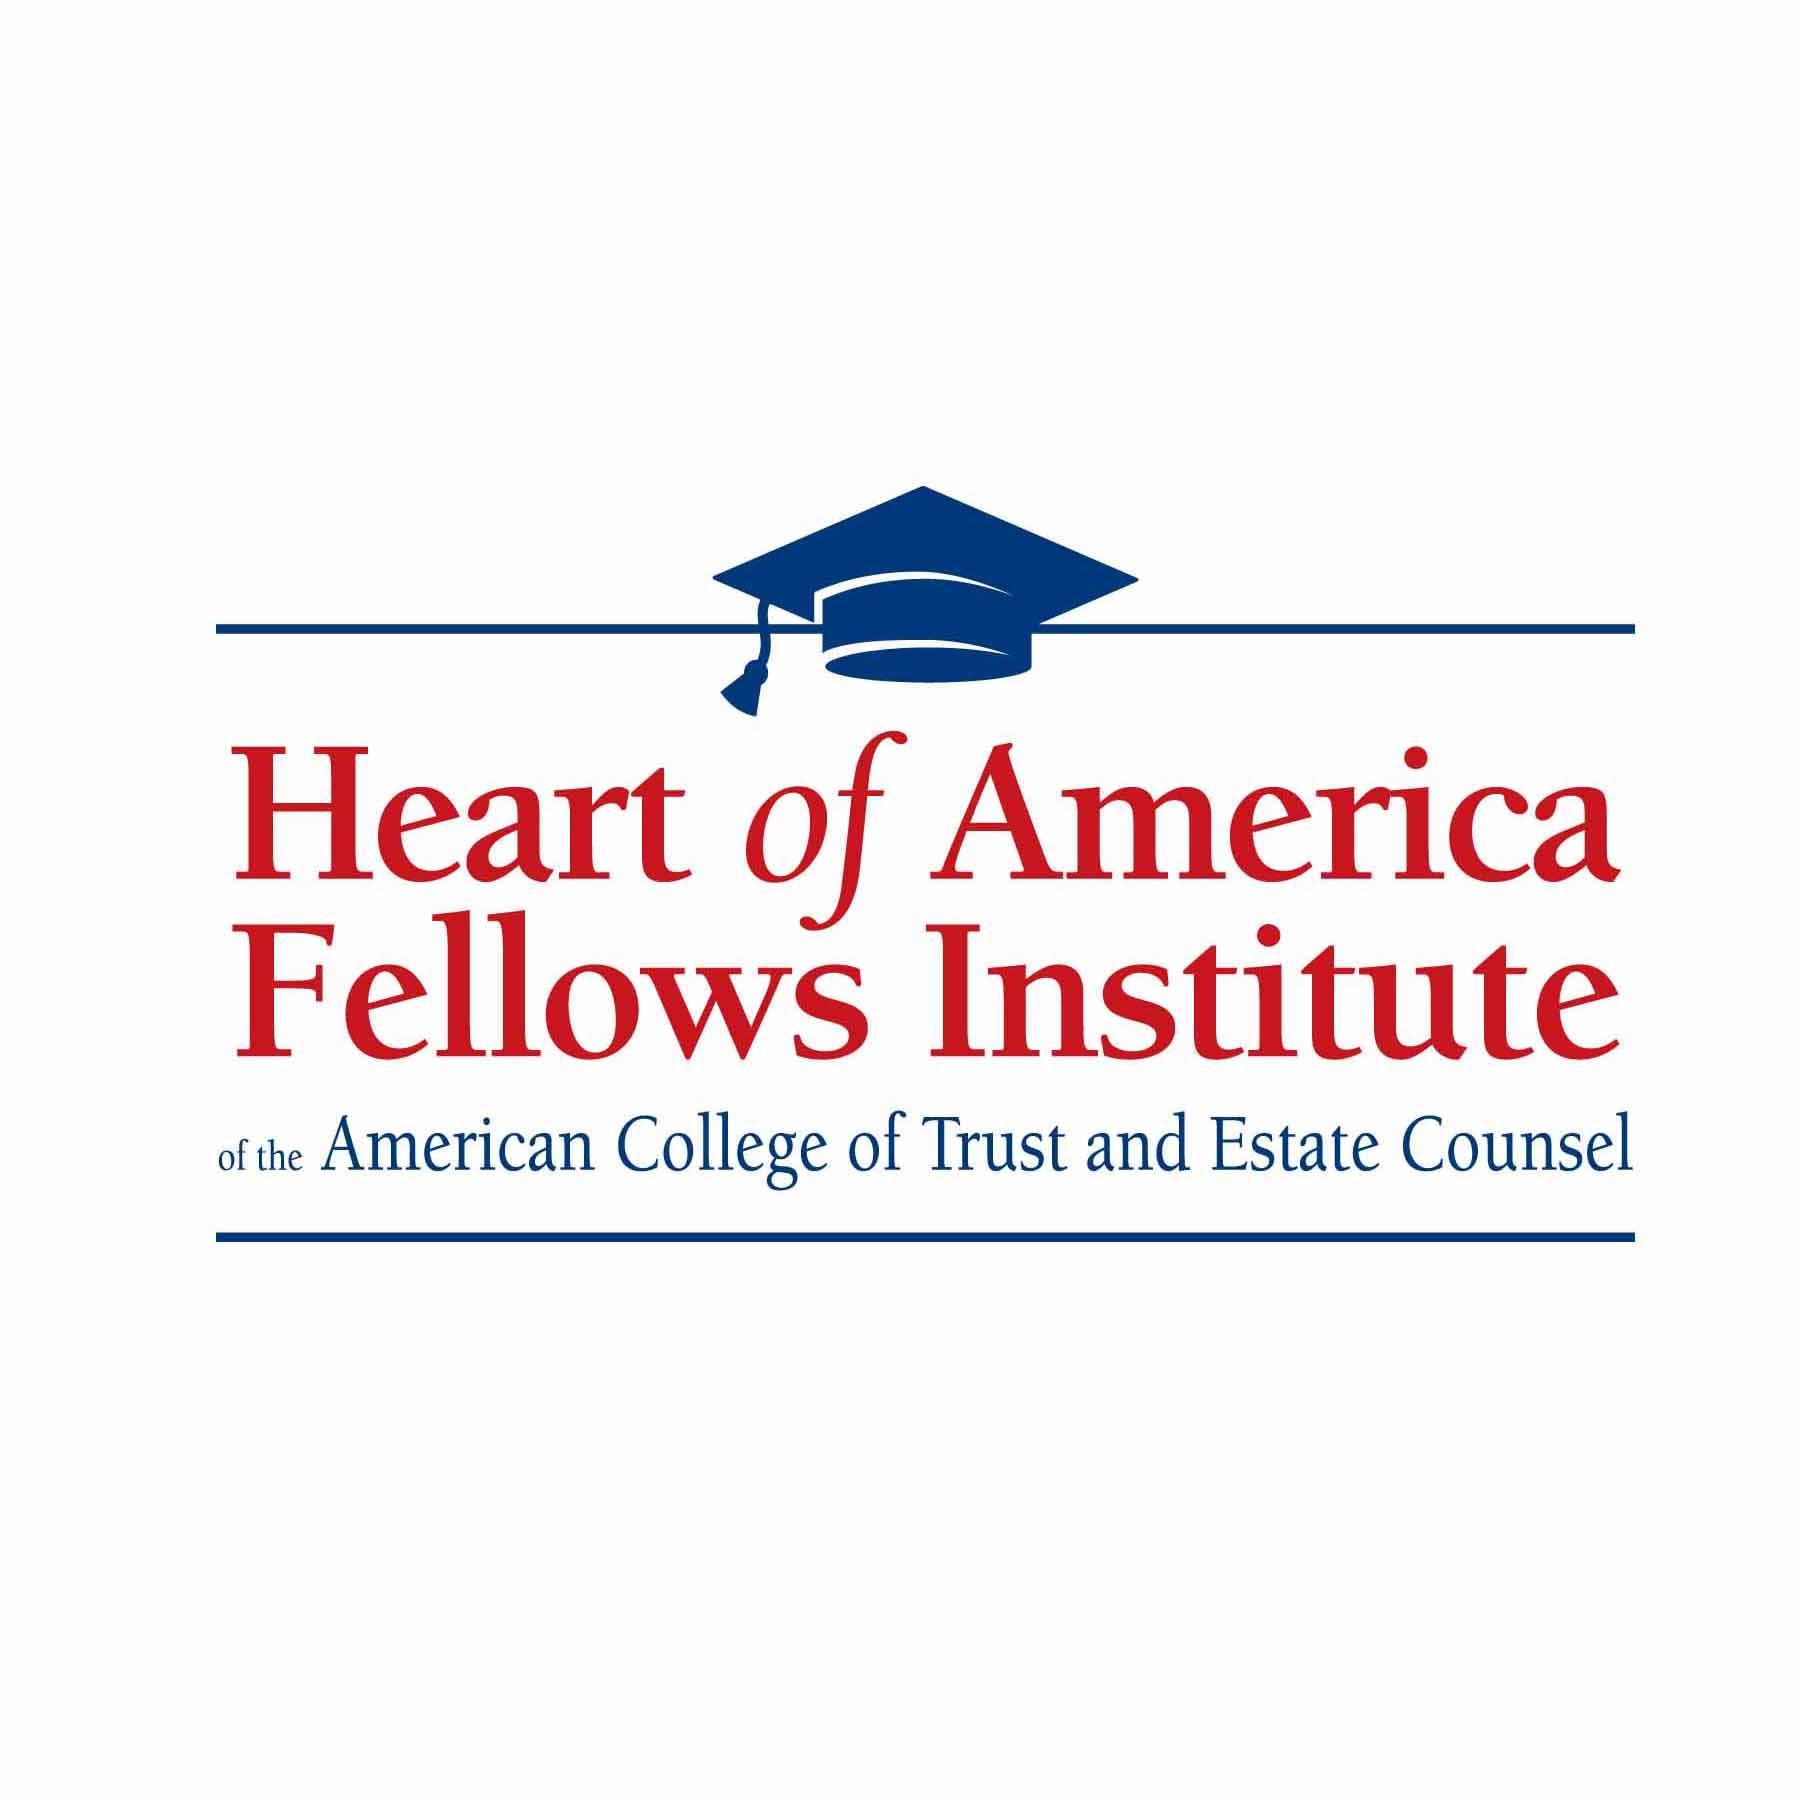 Heart of America Fellows Institute